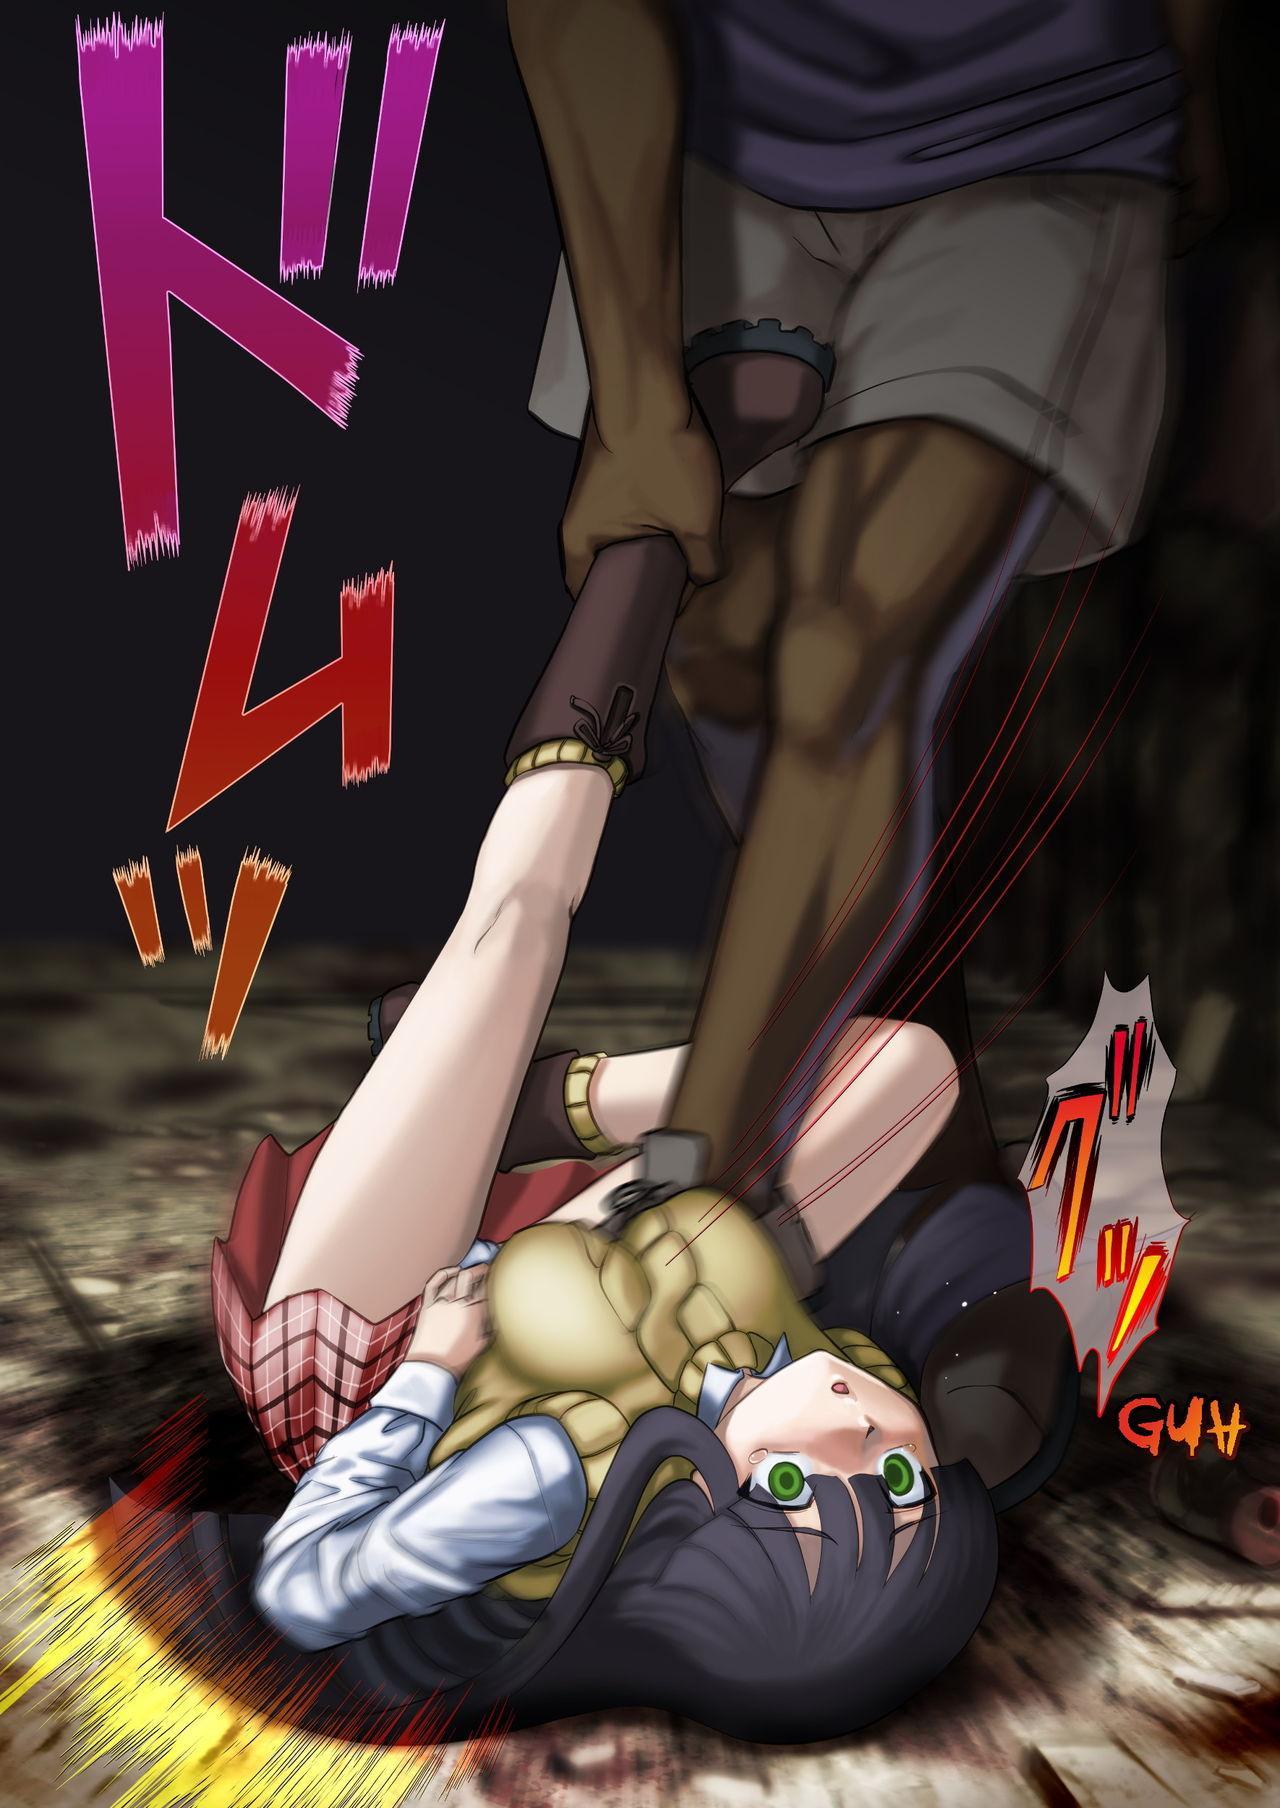 (C74) [Youkai Ankake (Pickles)] Tobenai Tori 3 ~Kagonotori~   Flightless Bird 3 ~Caged Bird~ (Gad Guard) [English] [Eroneruneko] [Decensored] 6